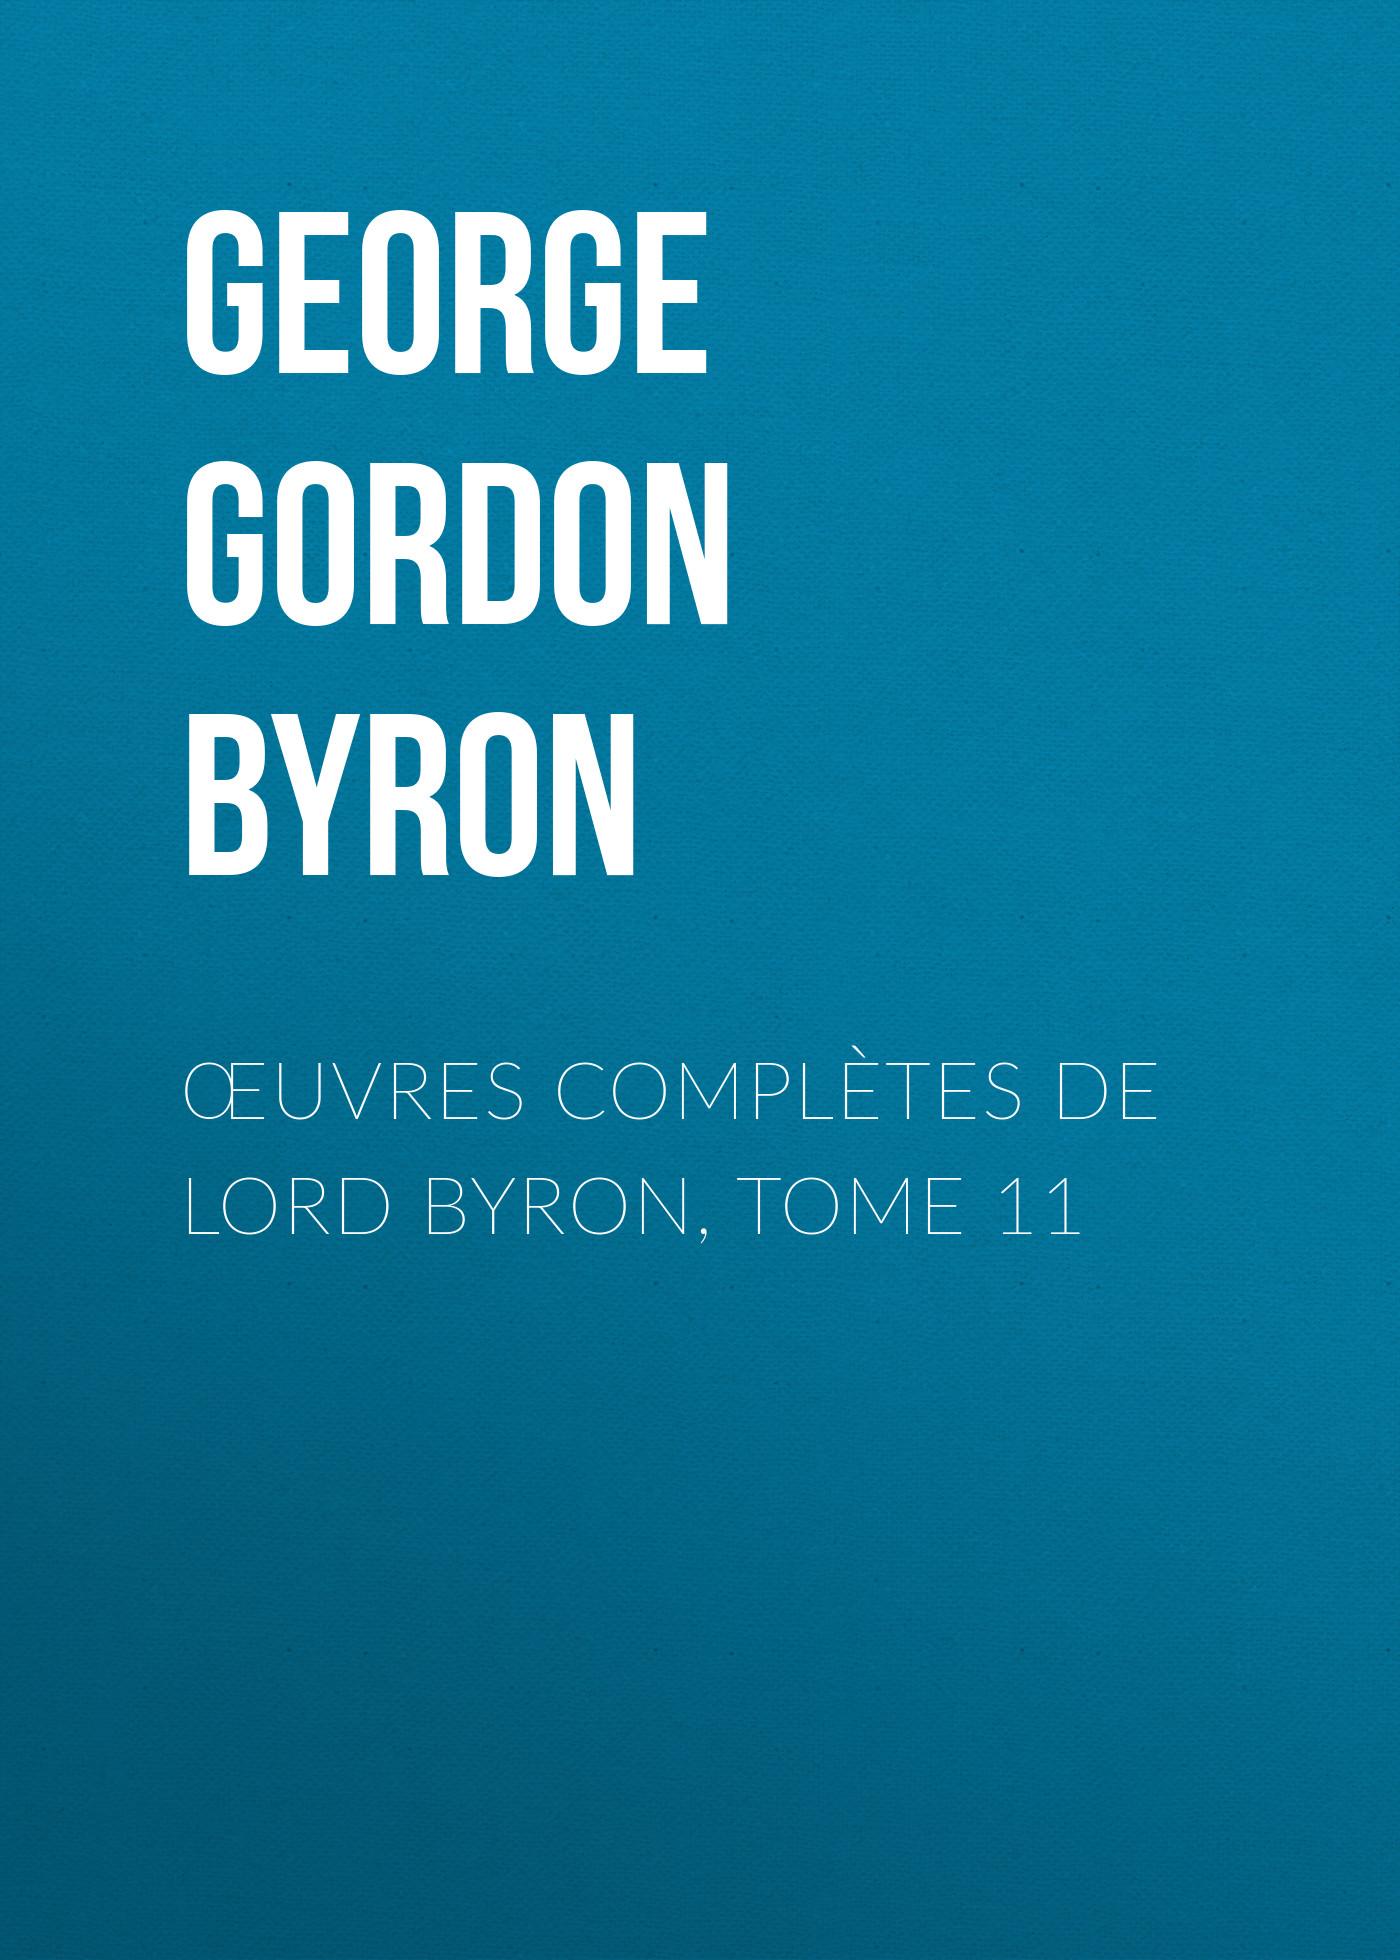 Джордж Гордон Байрон Œuvres complètes de lord Byron, Tome 11 thomas medwin conversations of lord byron